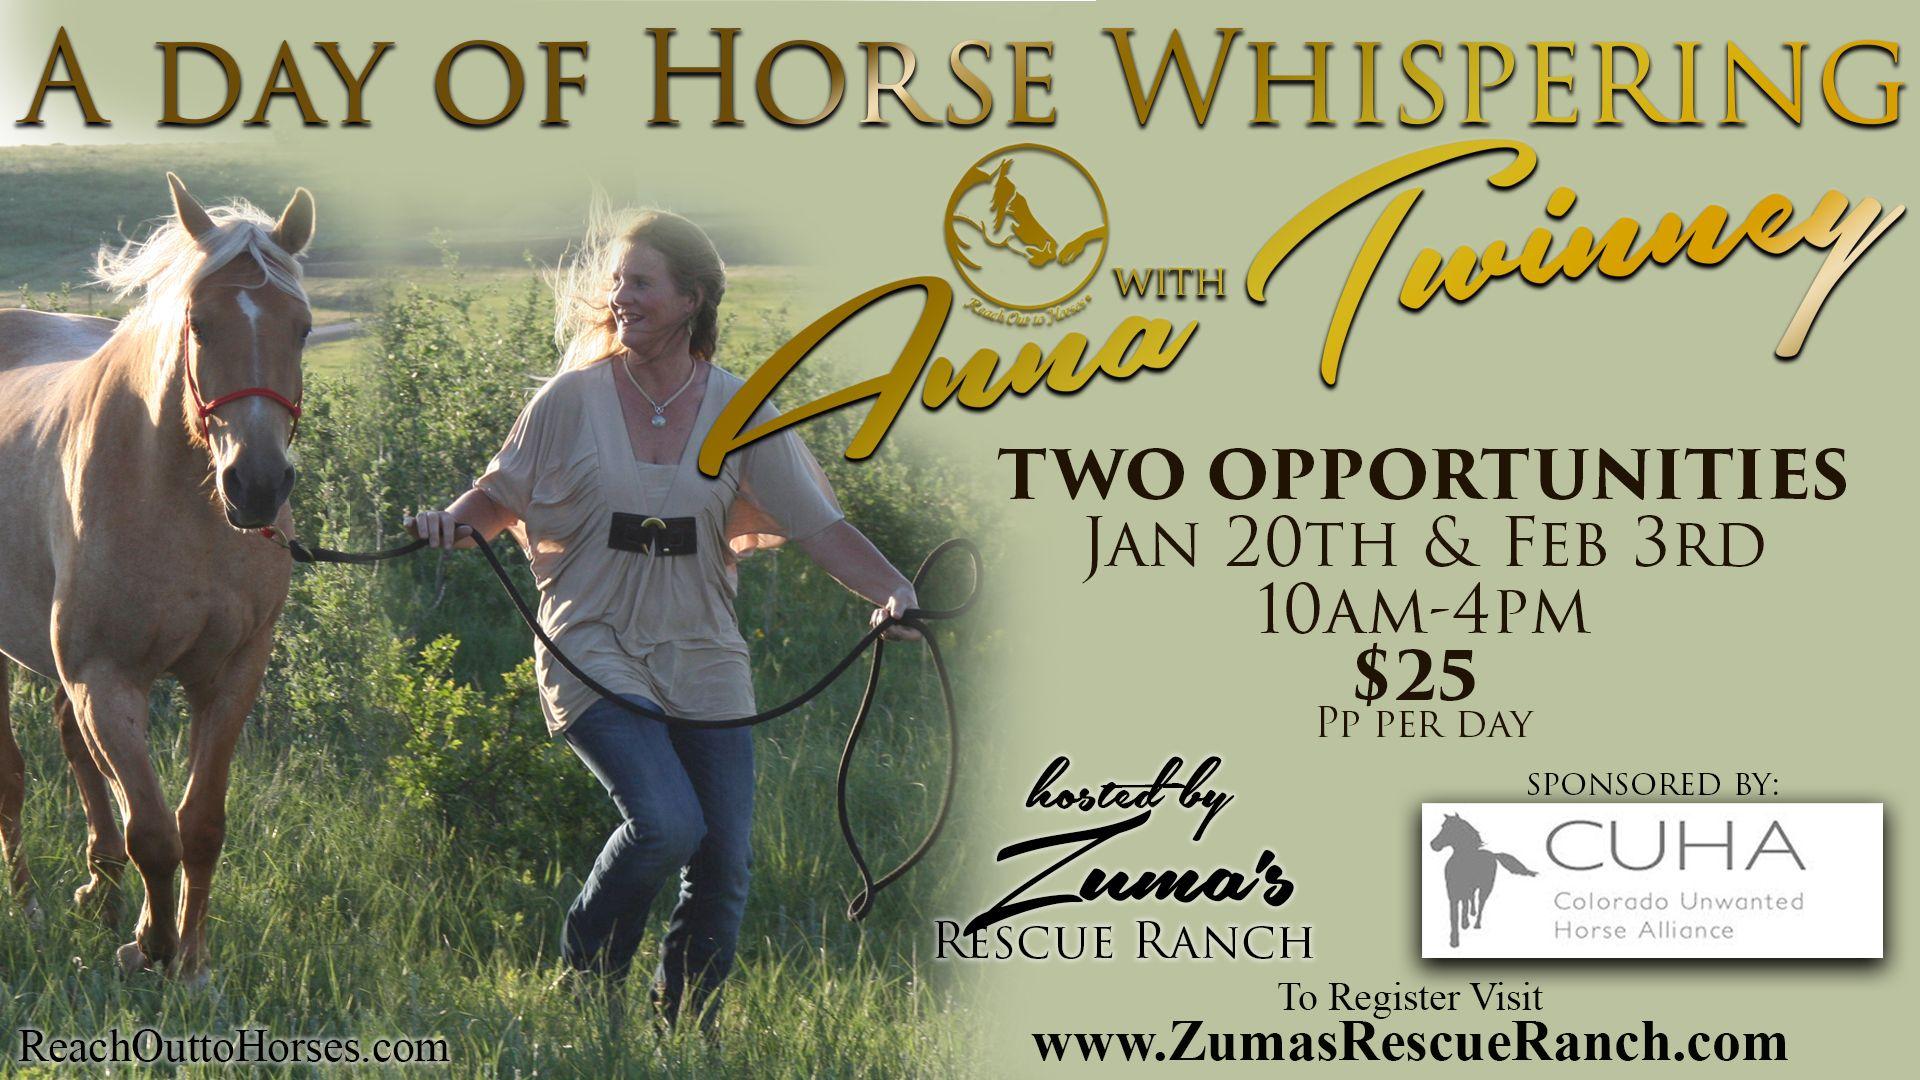 Anna Twinney Clinic February 3rd Clinic, Horse trainer